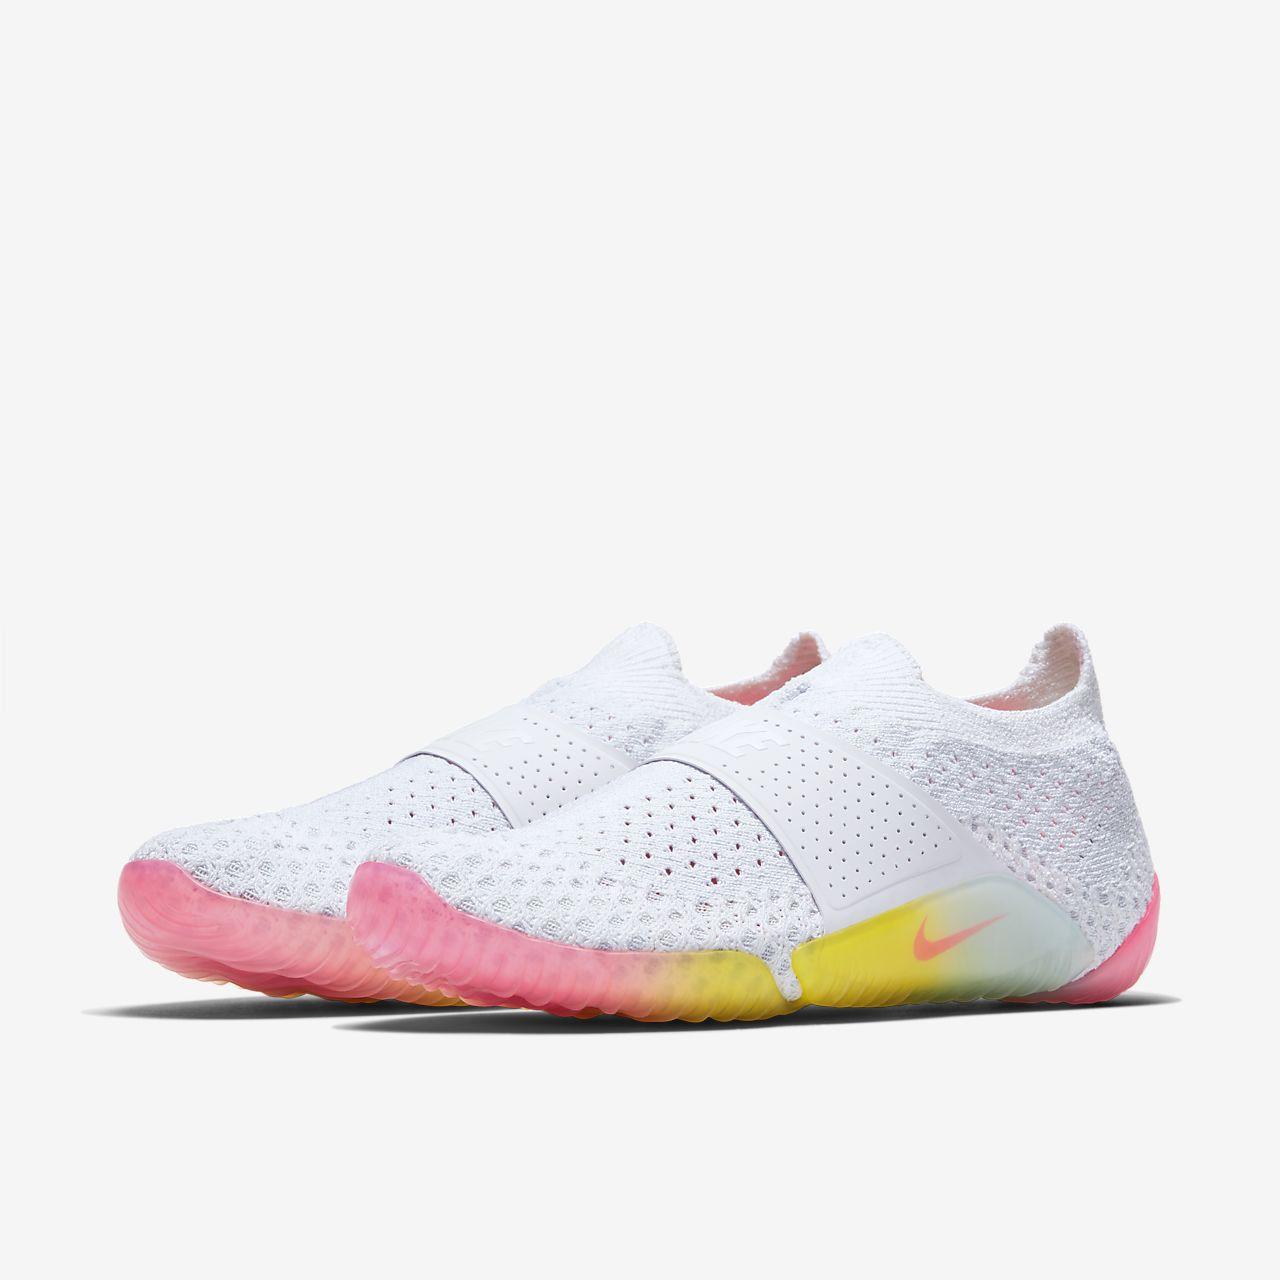 edf7280f3f27a NikeLab City Knife 3 Flyknit Women s Shoe. Nike.com MY